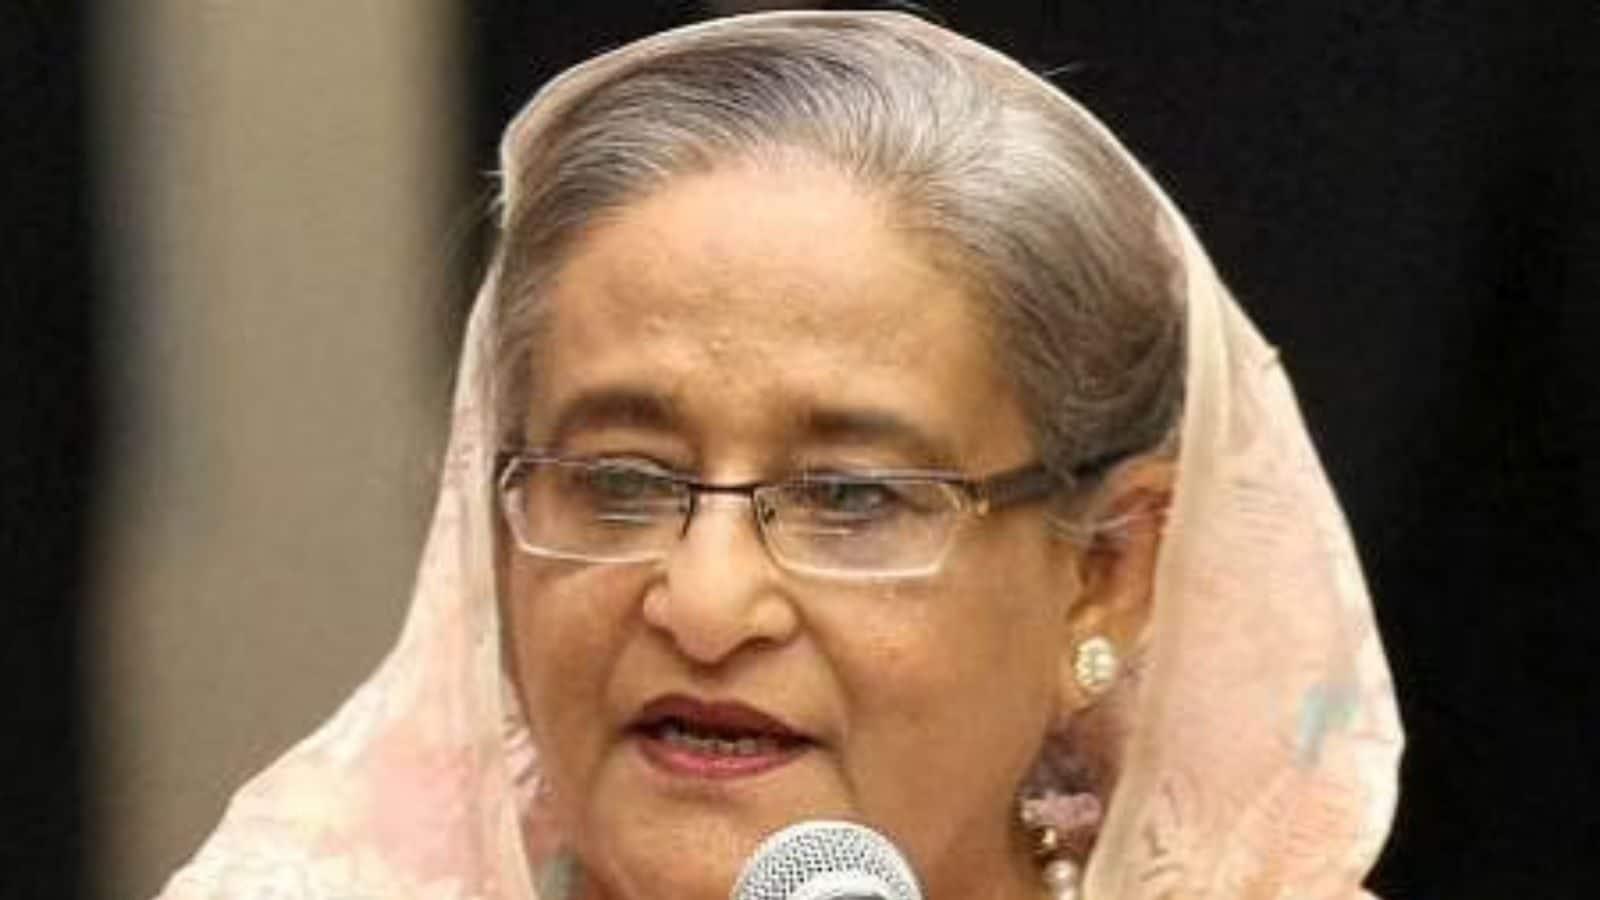 Certain Quarters with Vested Interests Tarnishing Bangladesh's Image, Says PM Hasina